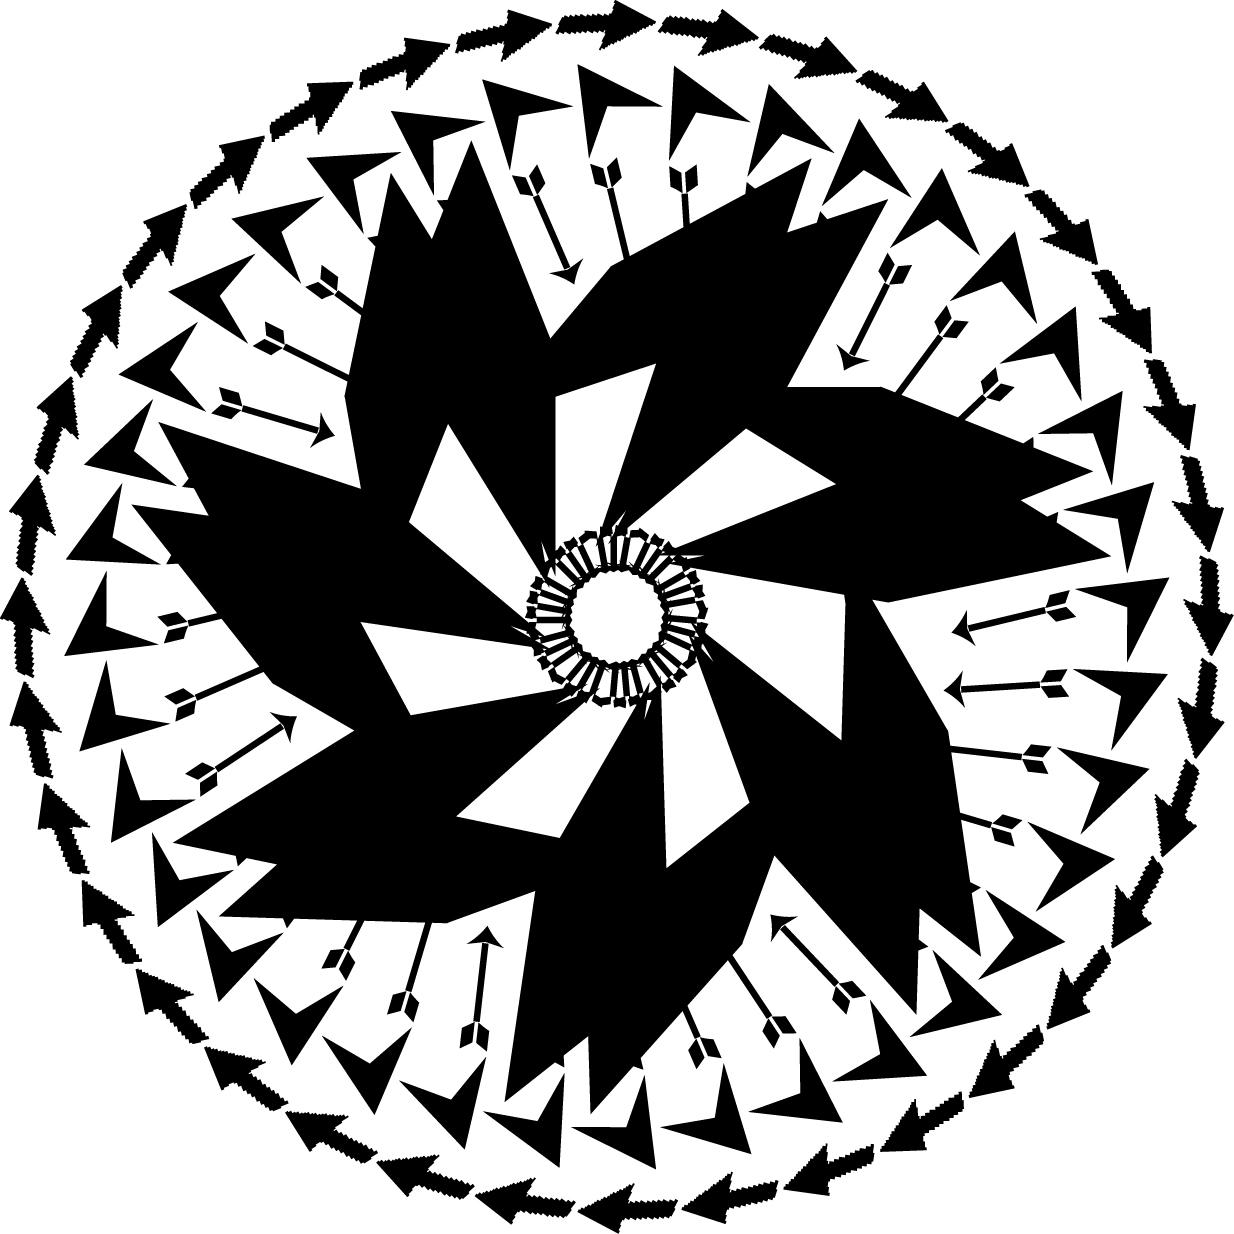 Symetrical Designs symmetrical patterns & letter designs | anan